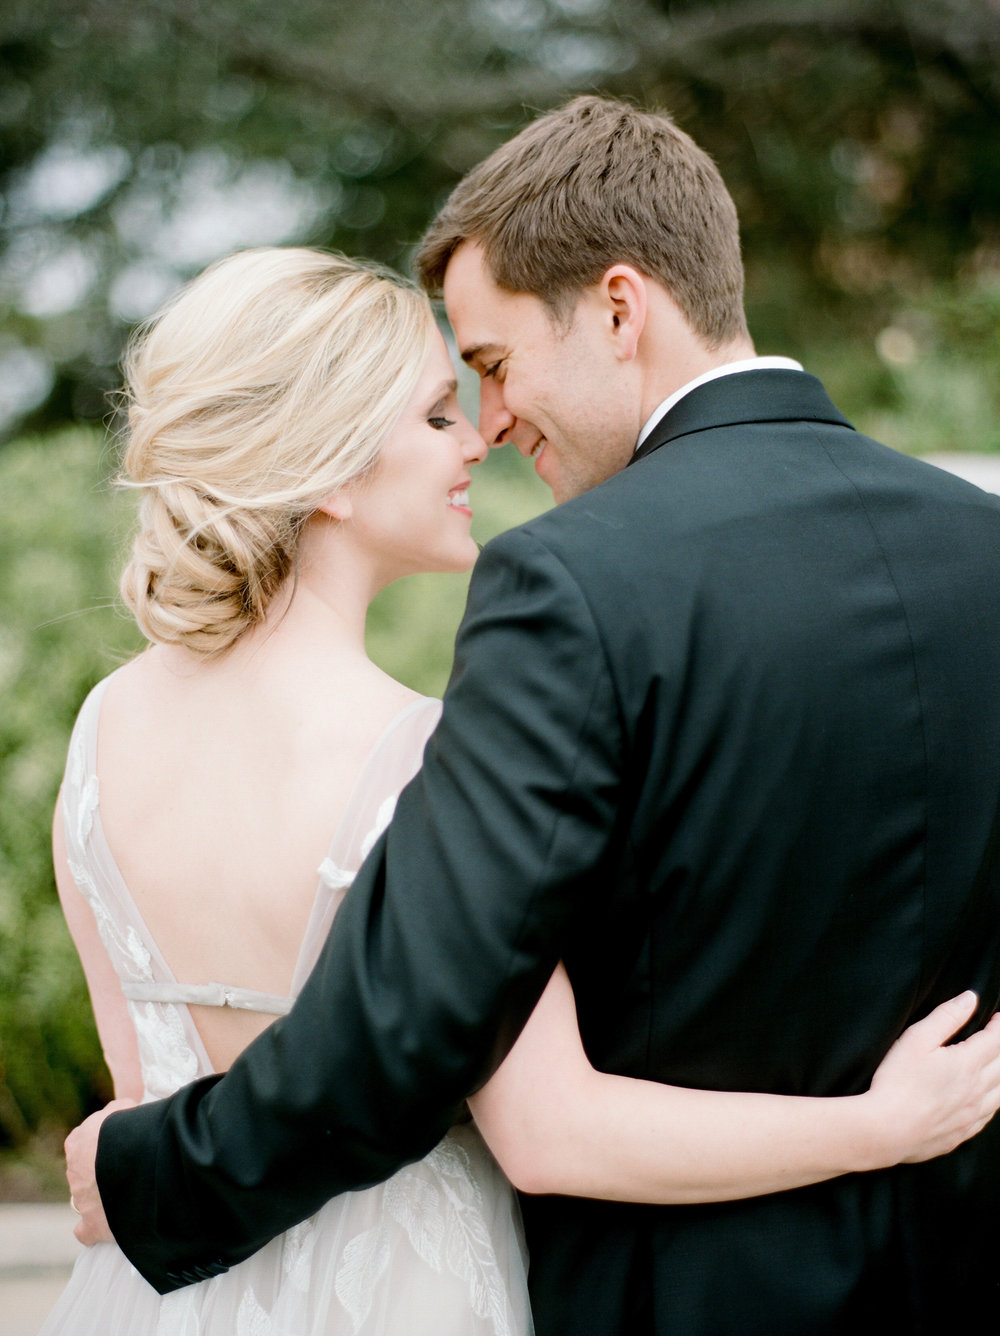 McGovern-Centennial-Gardens-Houston-Texas-Wedding-Venue-Josh-Dana-Fernandez-Photography-Film-Destination-Fine-Art-Luxury-Top-Best-Austin-Dallas-Magnolia-Rouge-Jennifer-Laura-Design-1.jpg